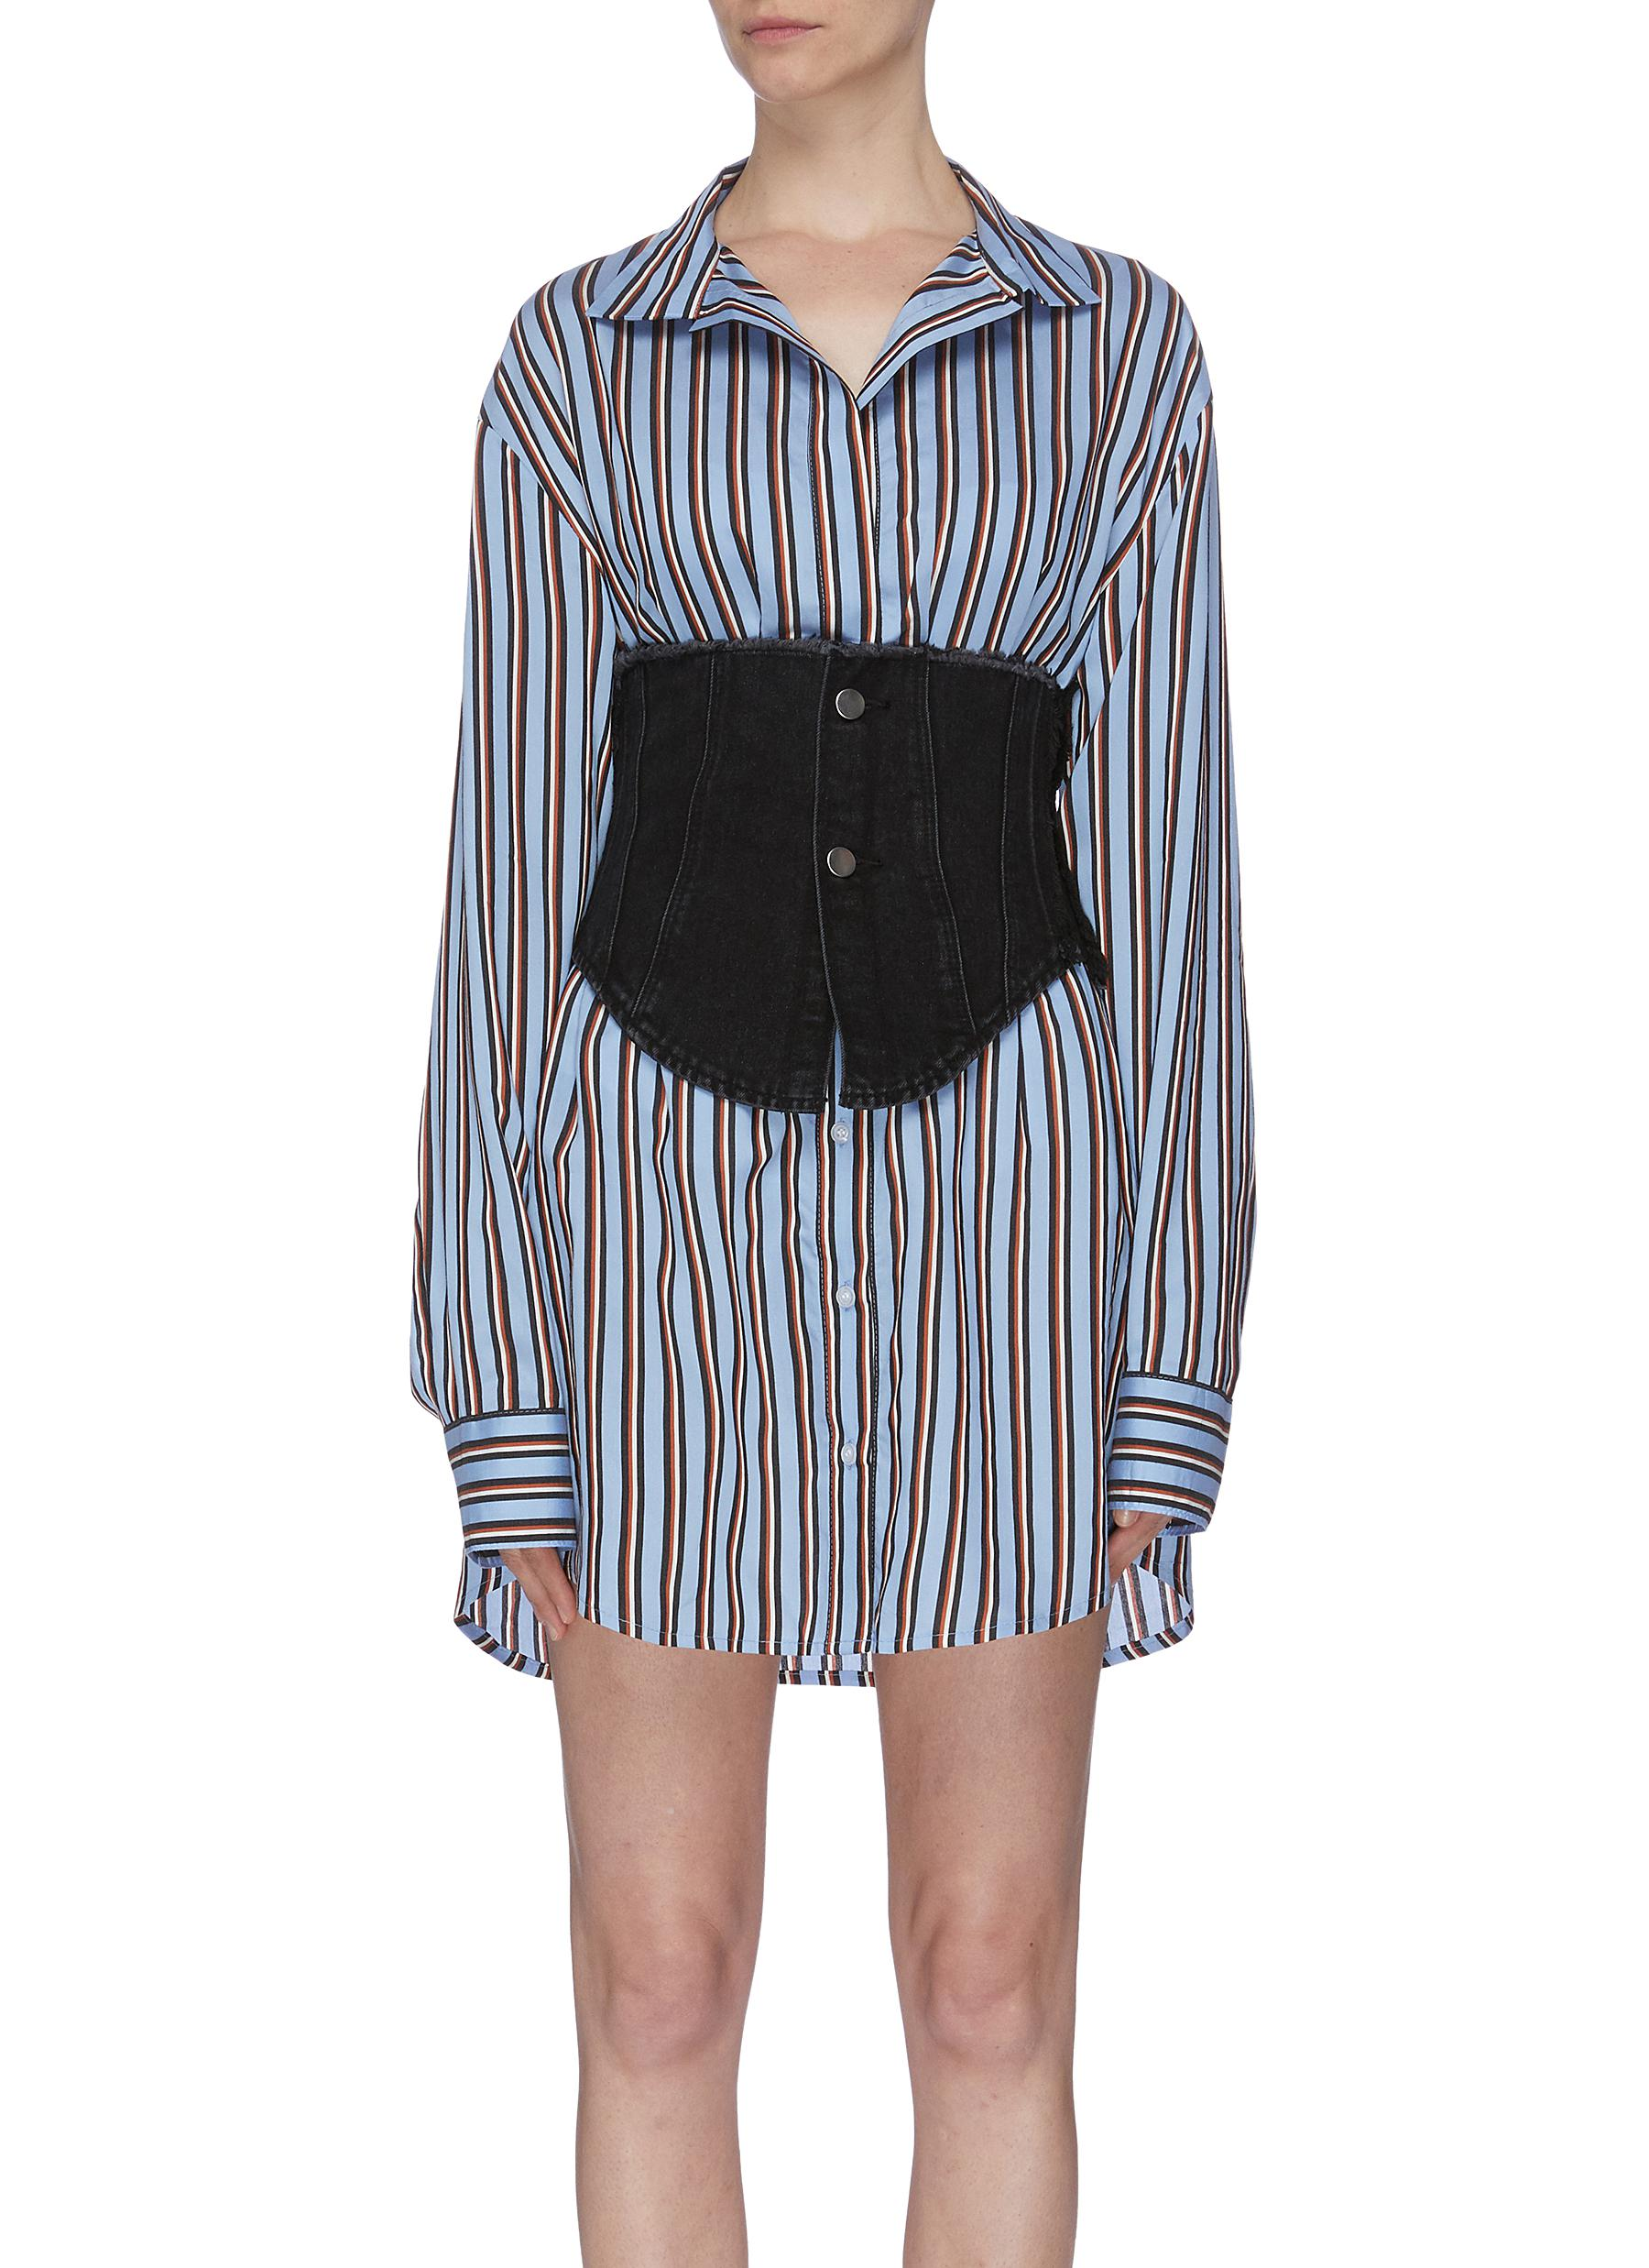 Contrast denim corset striped shirt dress by Ground Zero